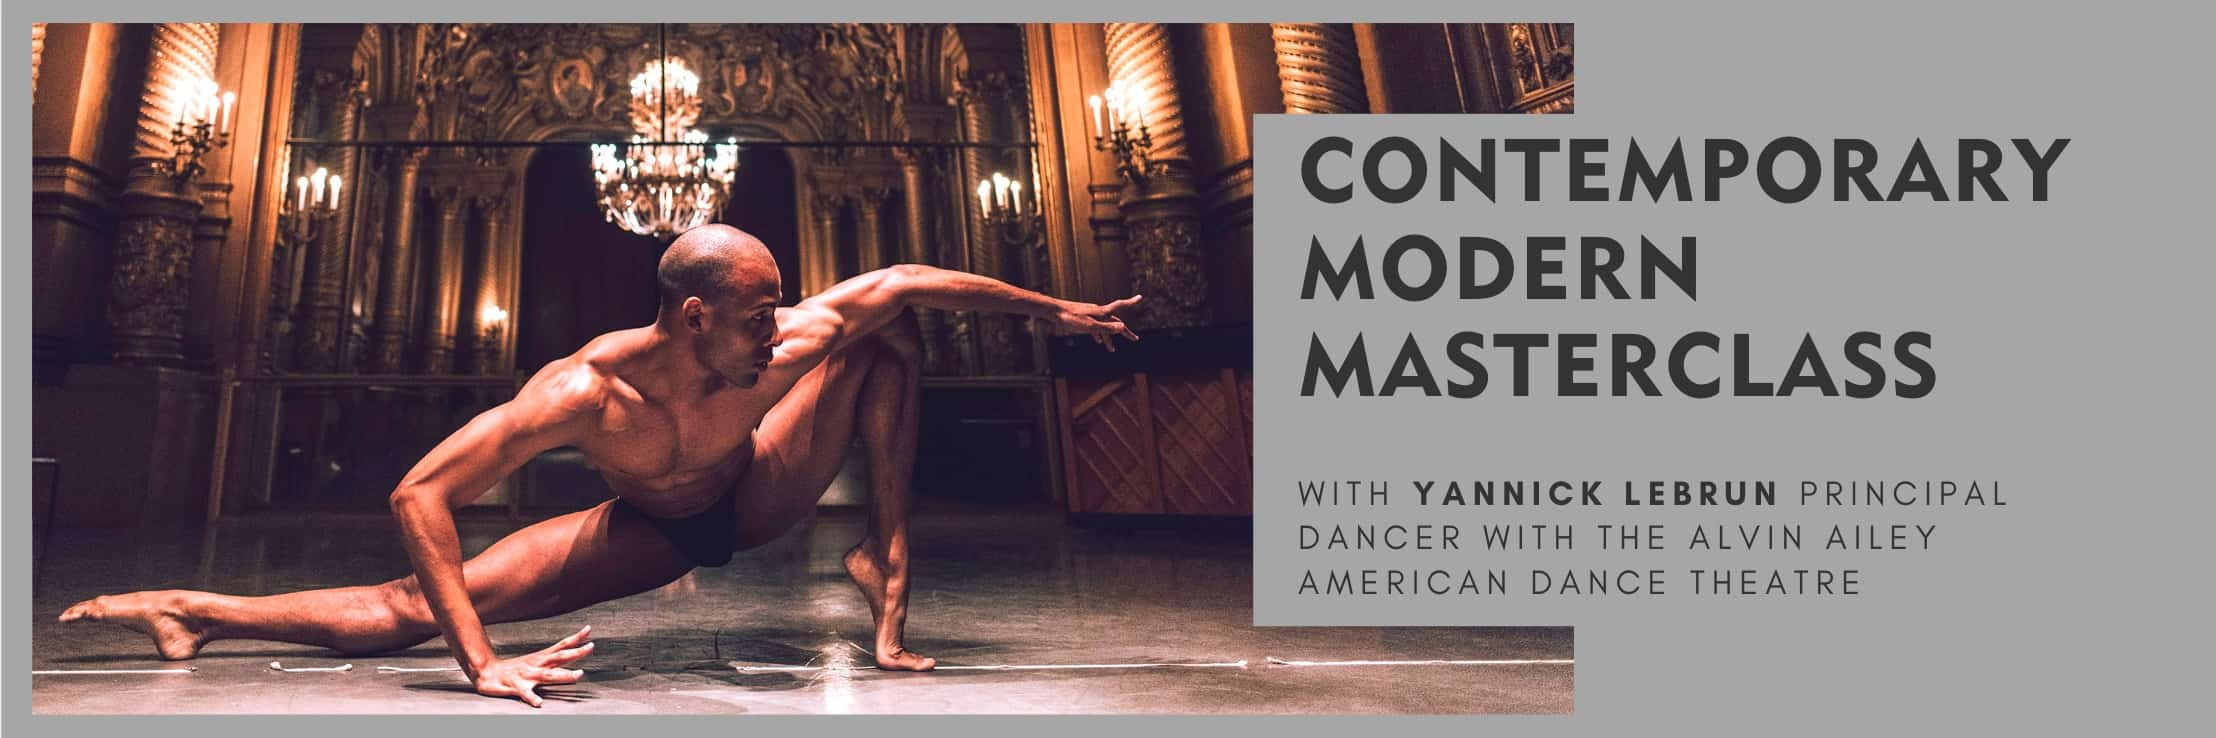 Masterclass with Yannick Lebrun at Danceworks